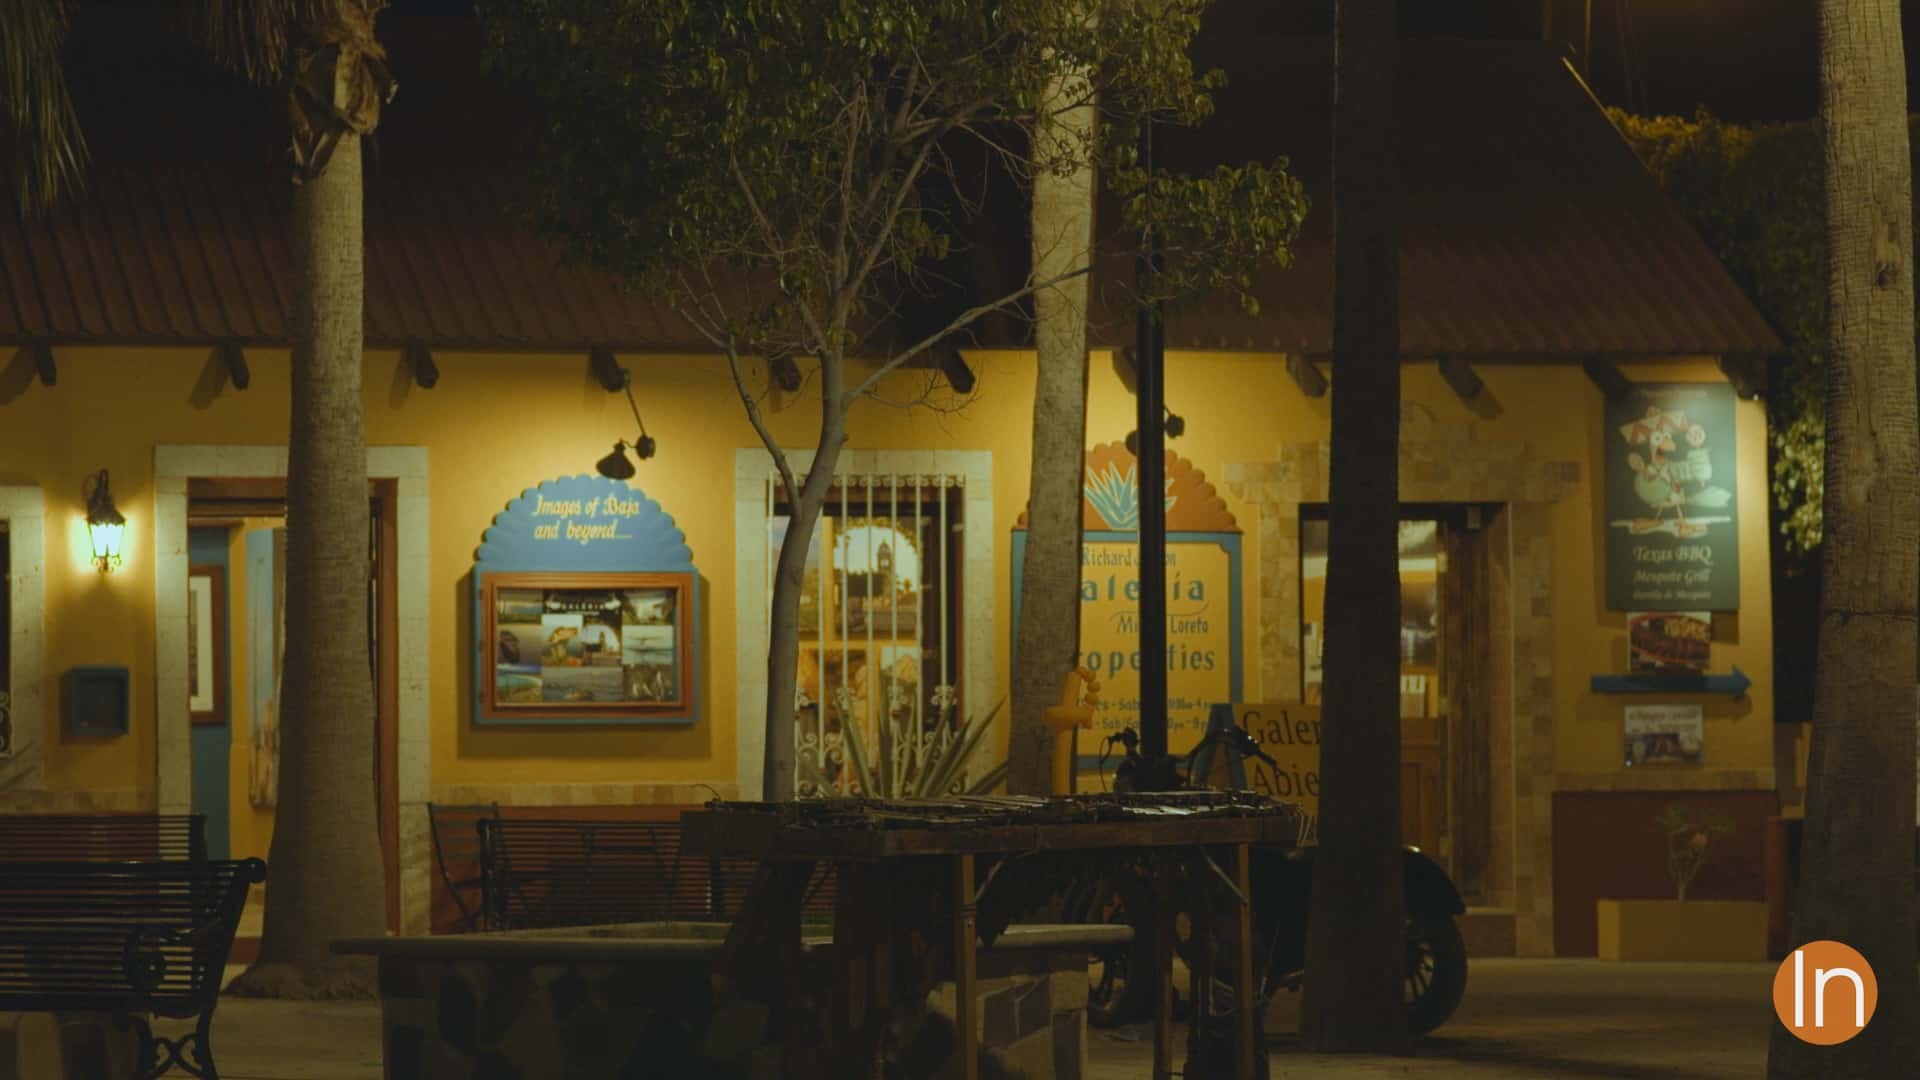 Town Square at Night - Loreto, Baja California Sur, Mexico